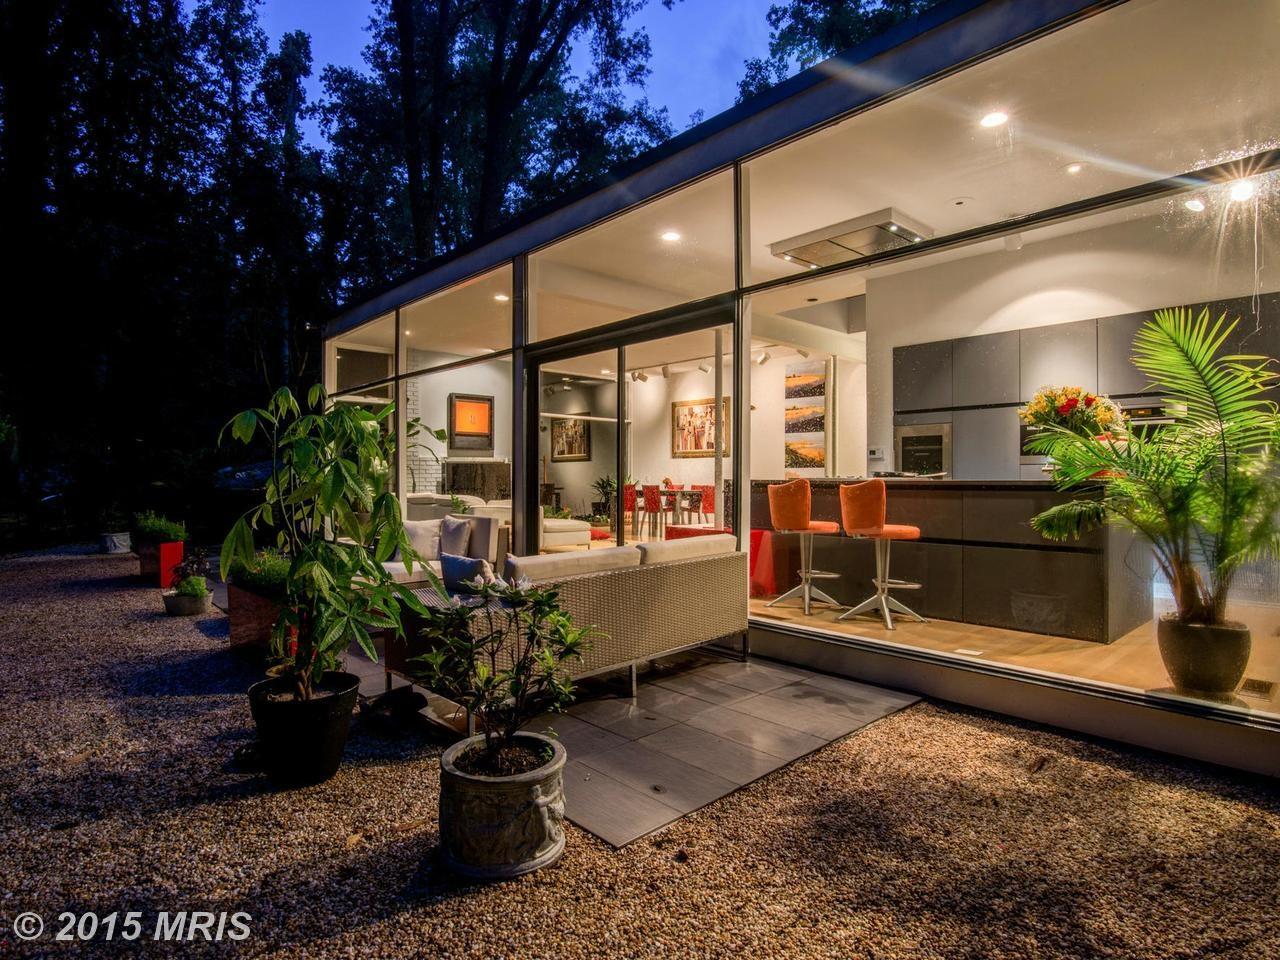 Терраса и задний фасад дома в вечернее время.